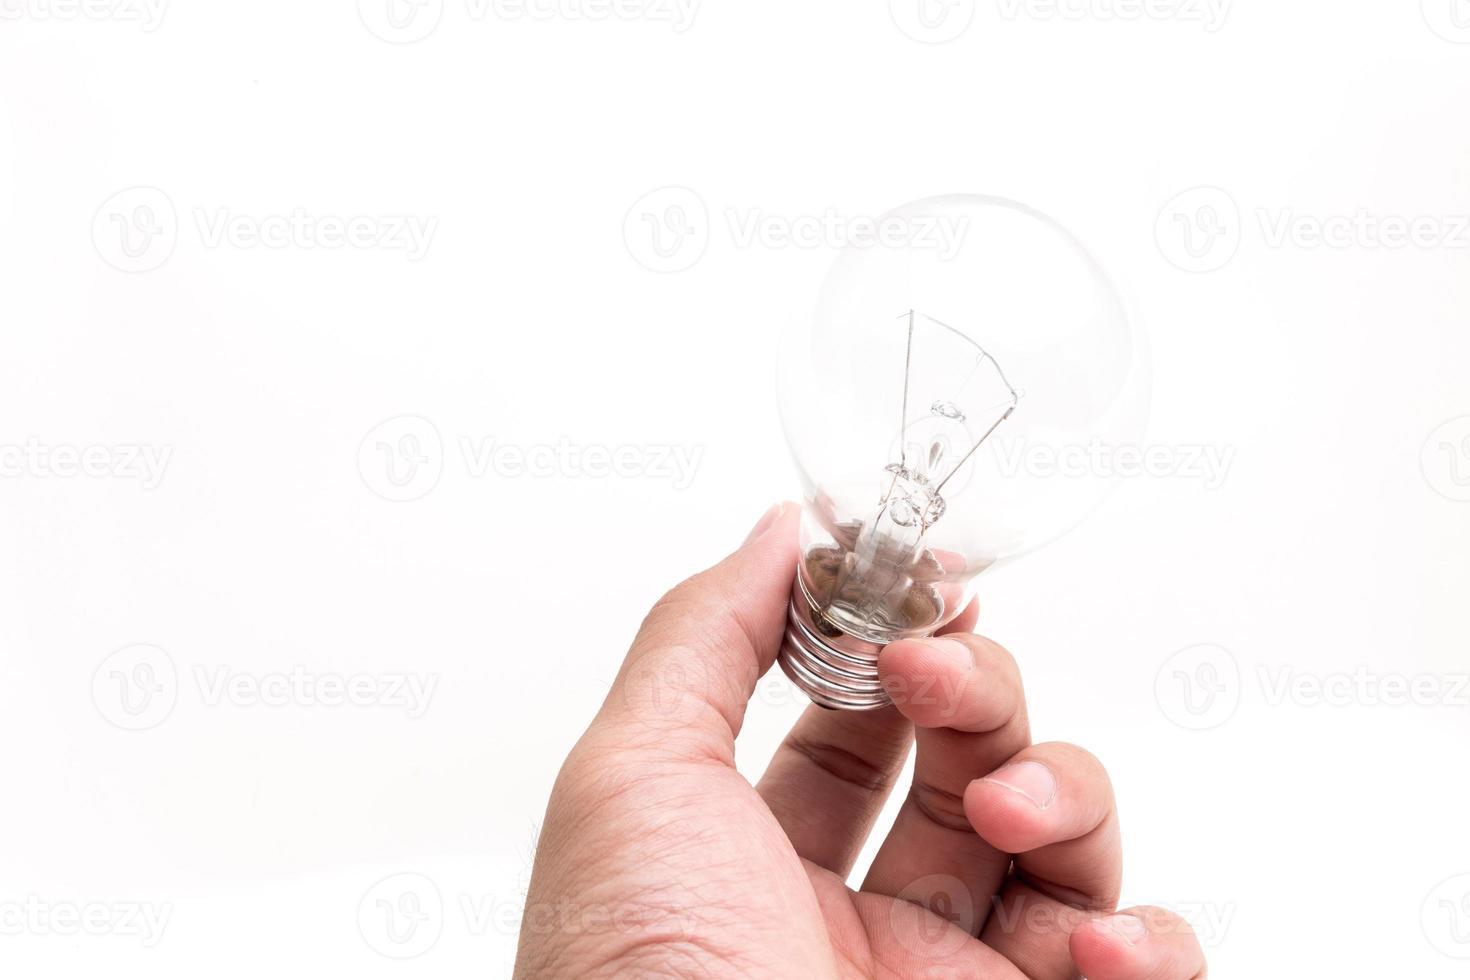 Incandescent lamp photo